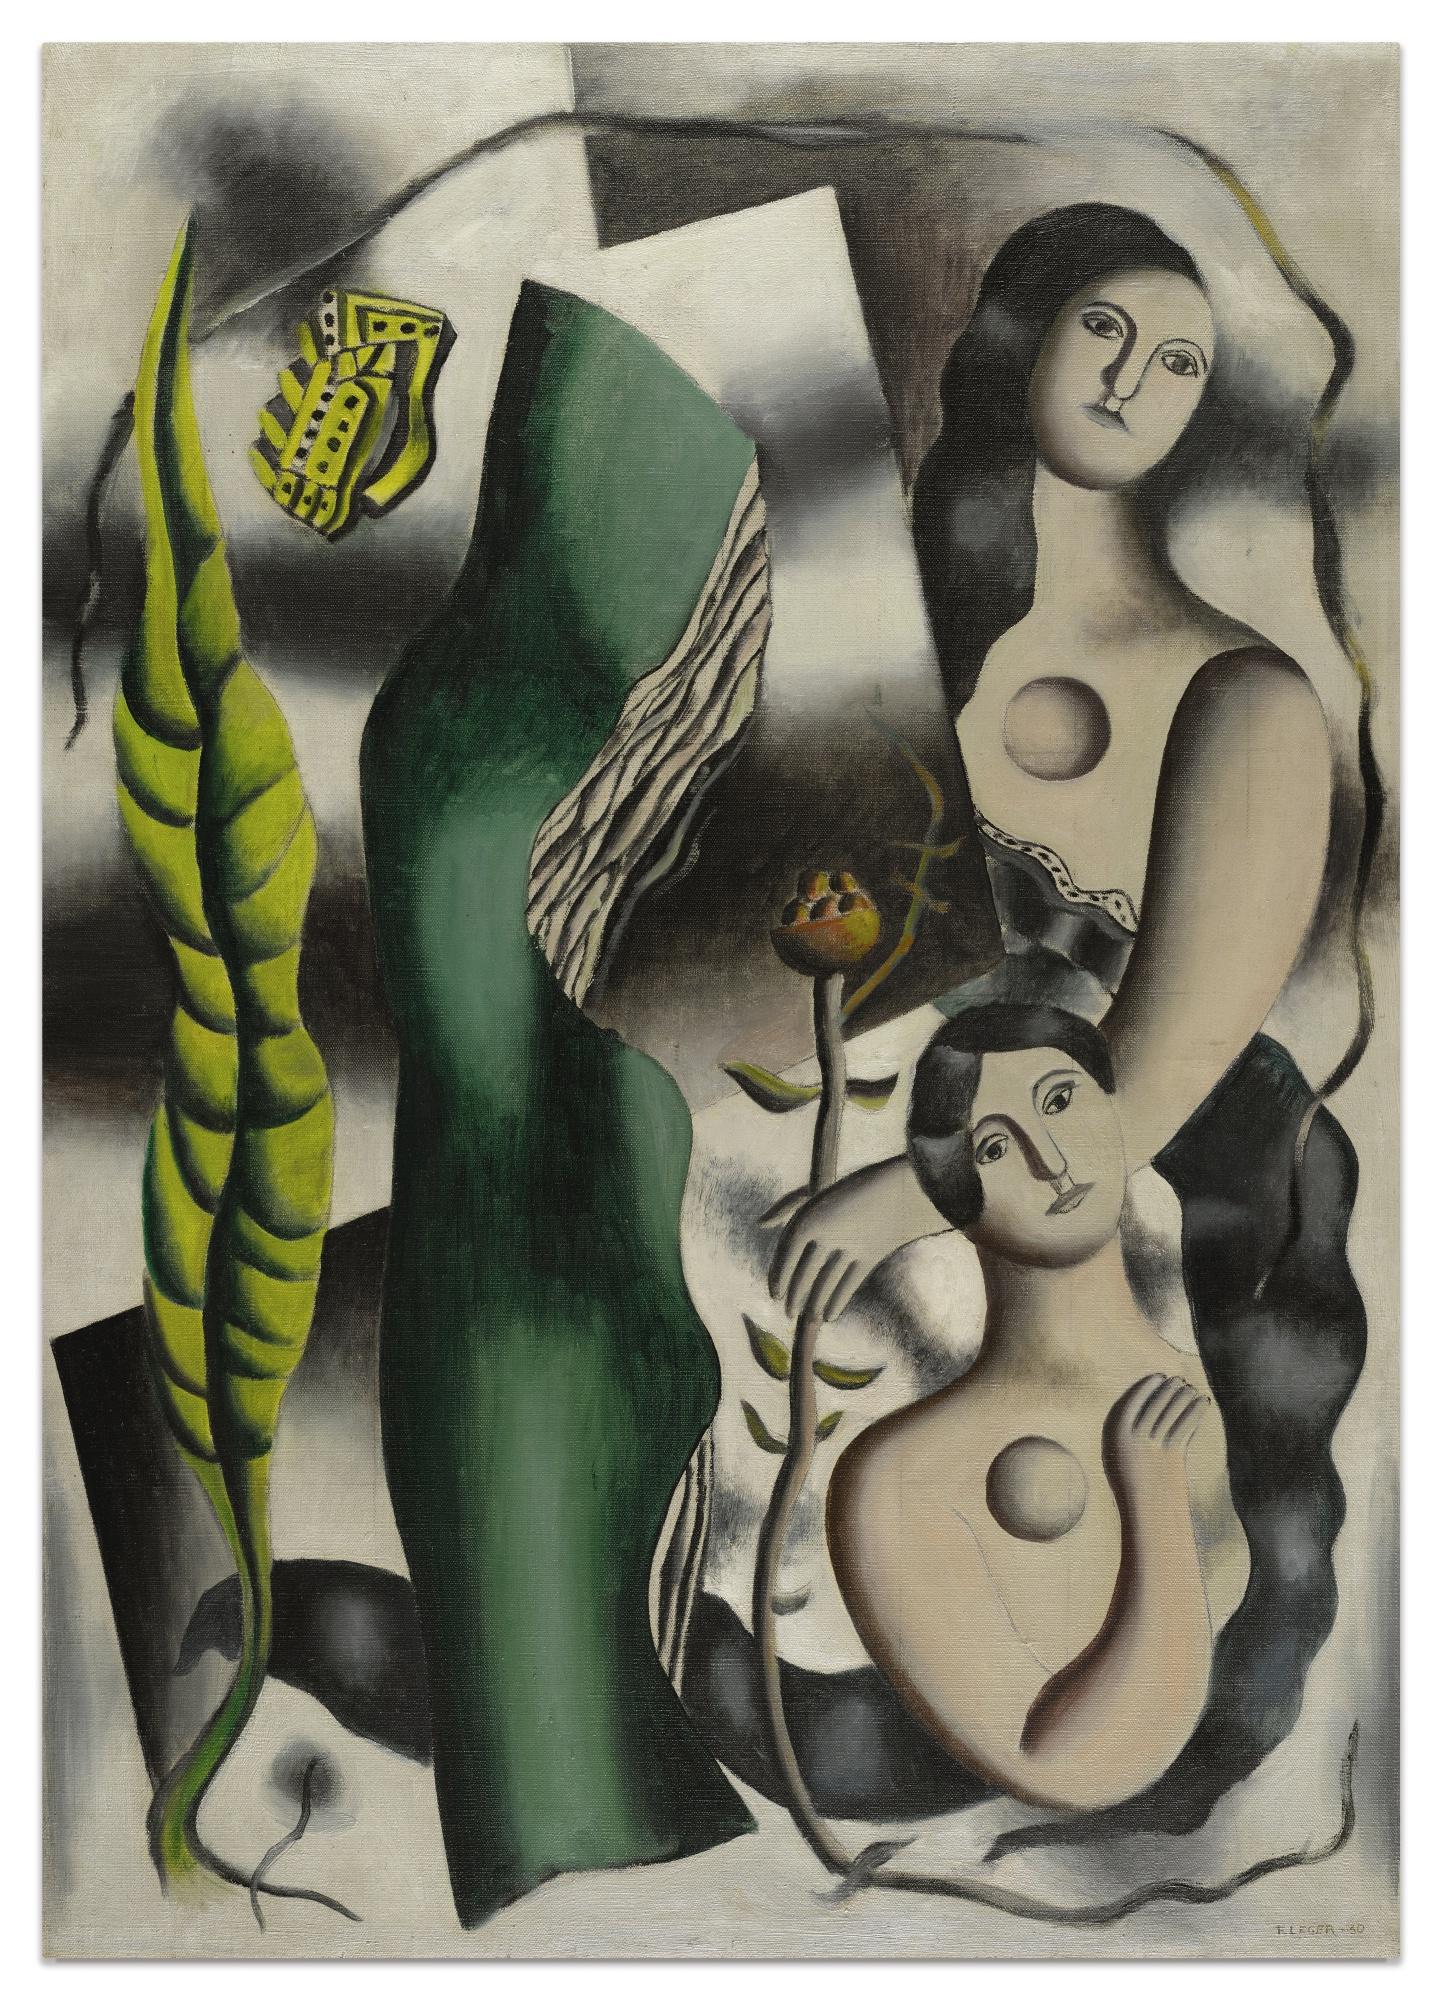 Brilla l'Art Week parigina di Sotheby's. Totale: 18.3 milioni €, +75% sul 2017